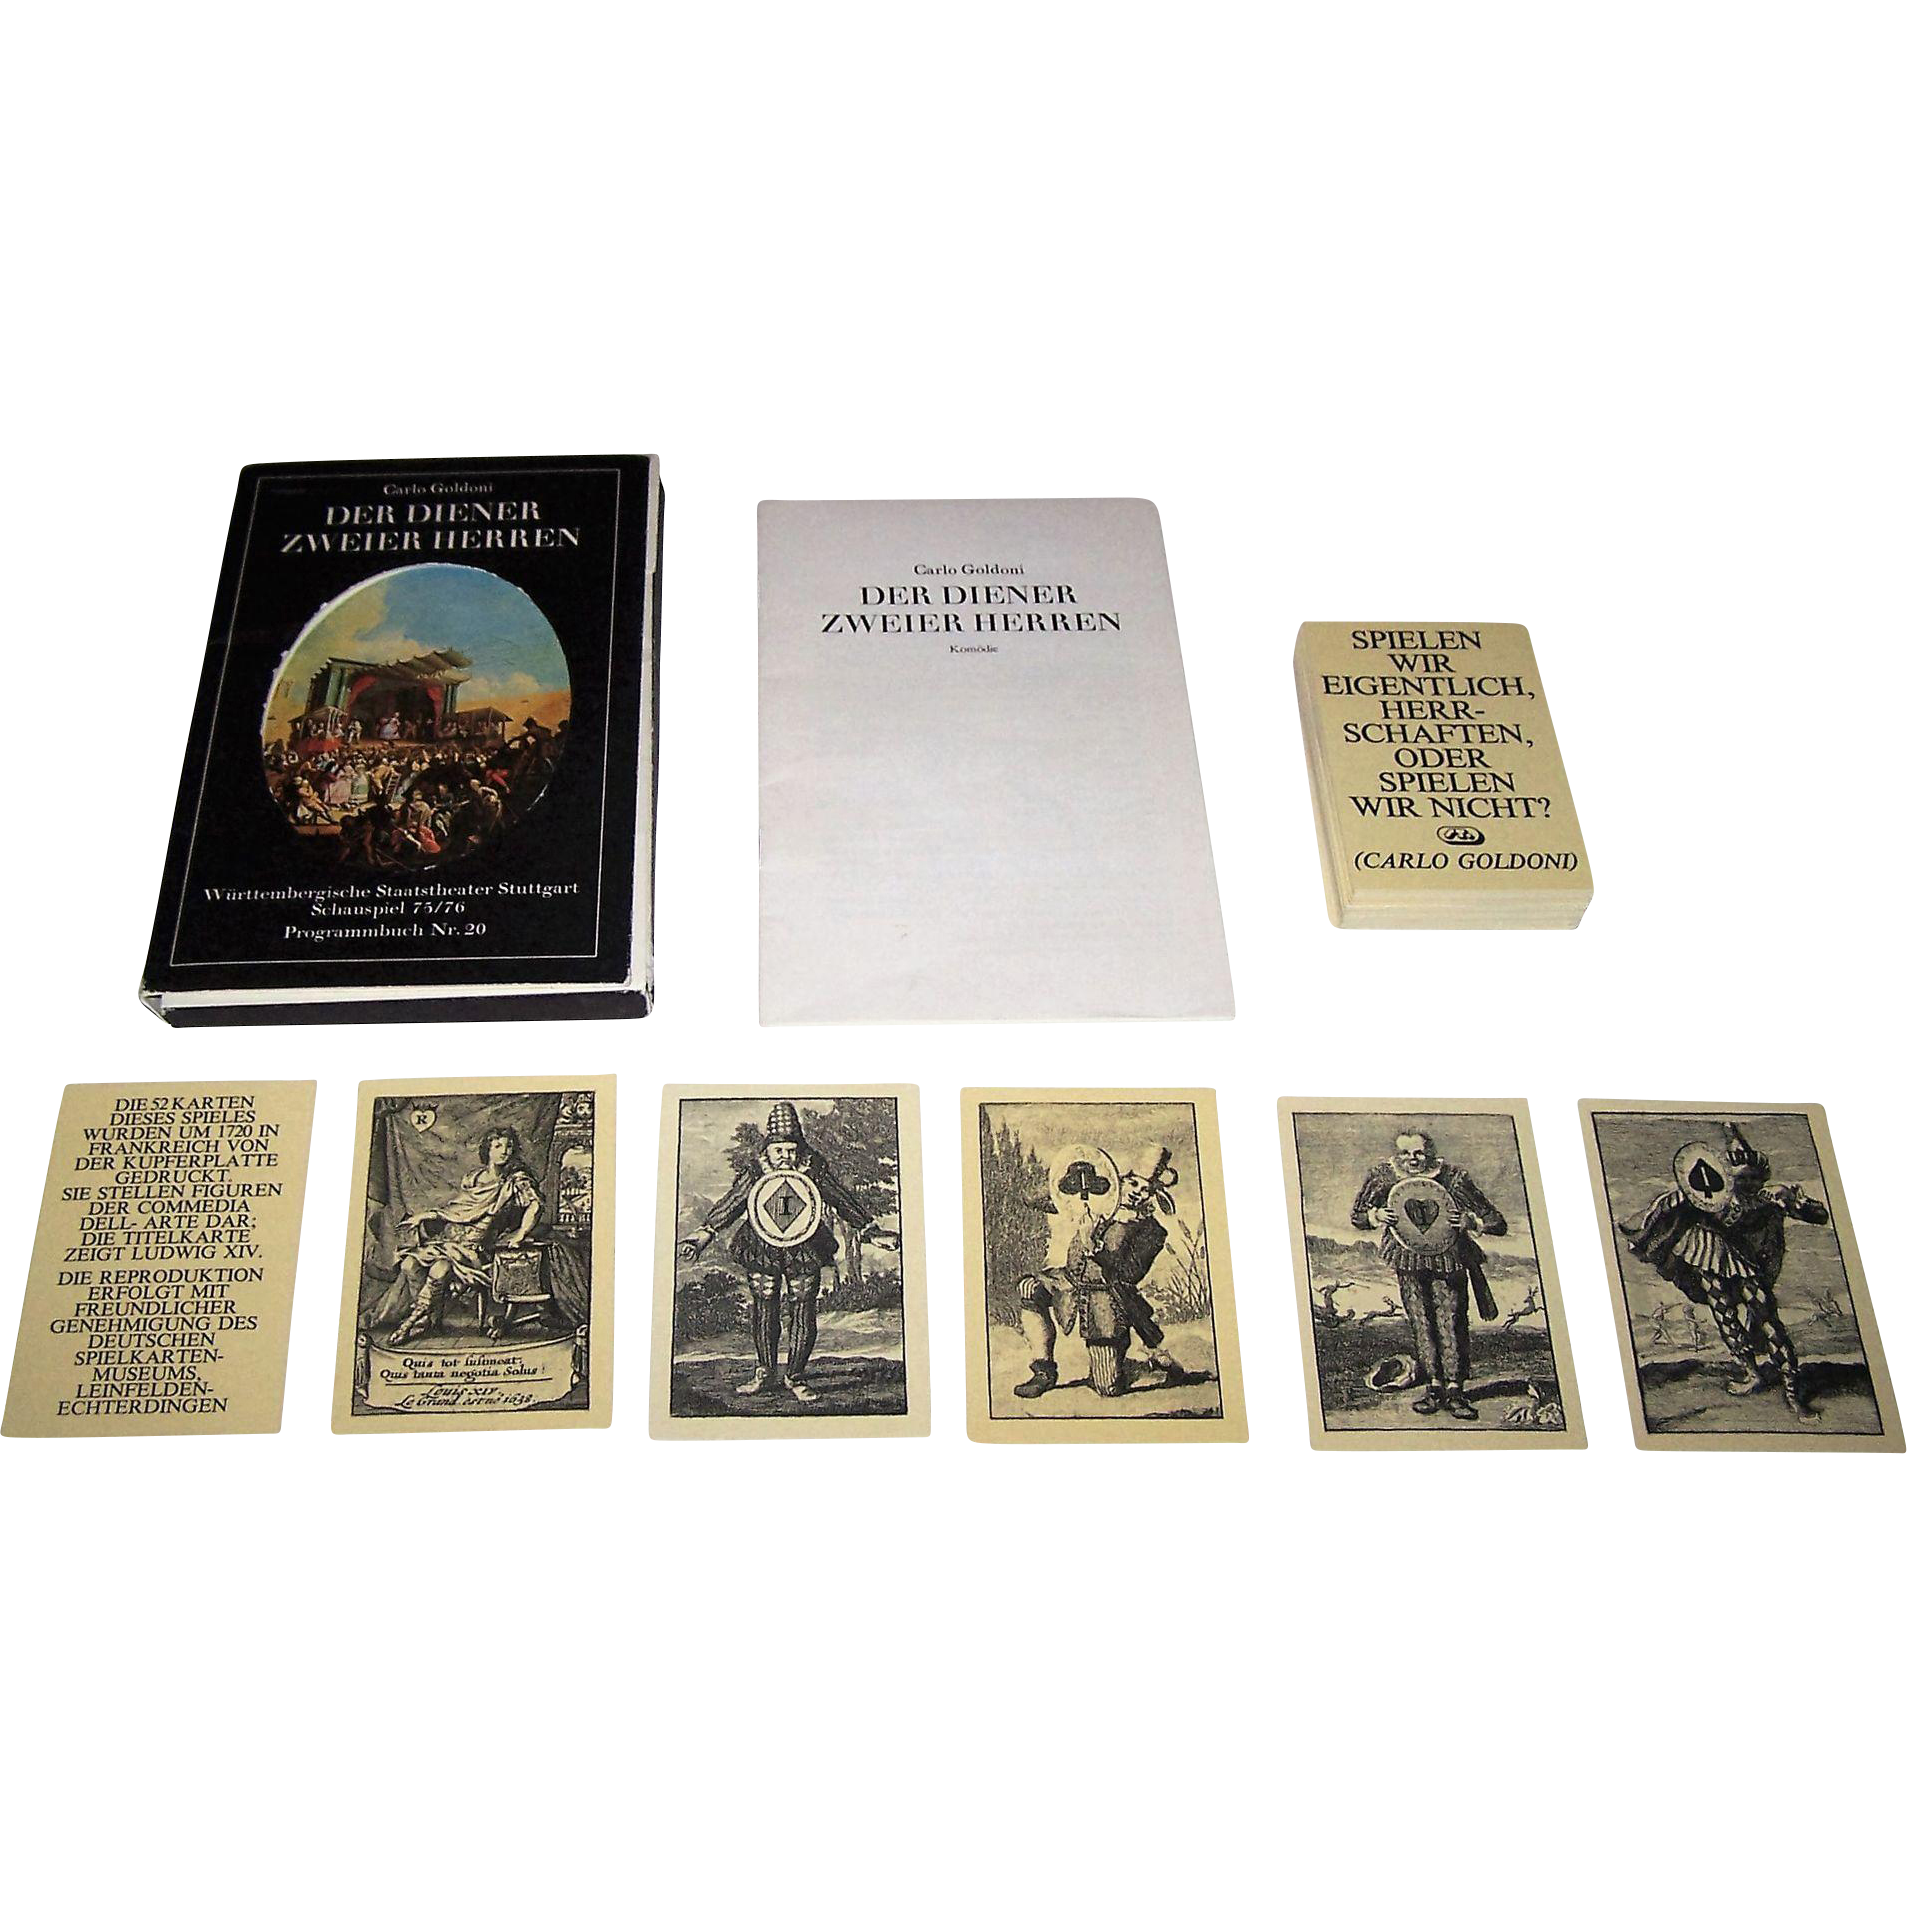 "Württembergische Staatstheater Stuttgart ""Der Diener Zweier Herren,"" (""Servant of Two Masters""), Carlos Goldoni Play, Commedia Dell'Arte Performers, Modern Edition of 18th Century Deck, 1976"